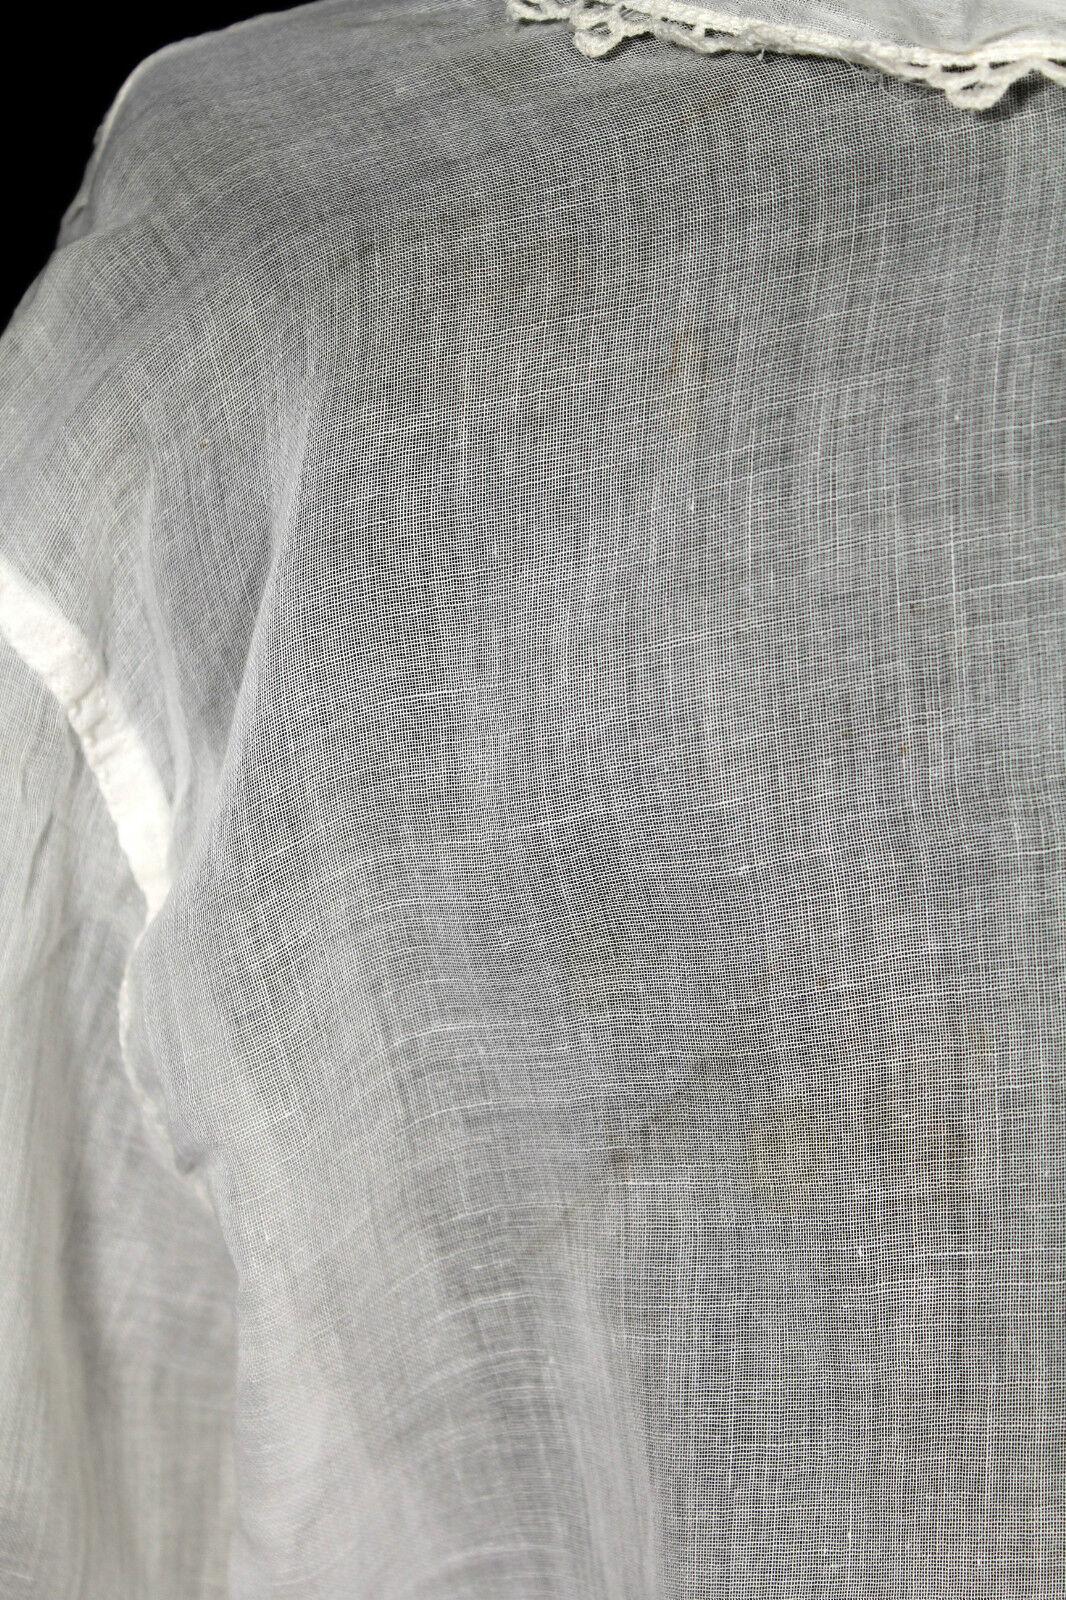 PLUS SIZE  46 ANTIQUE VINTAGE EDWARDIAN ERA WHITE… - image 5